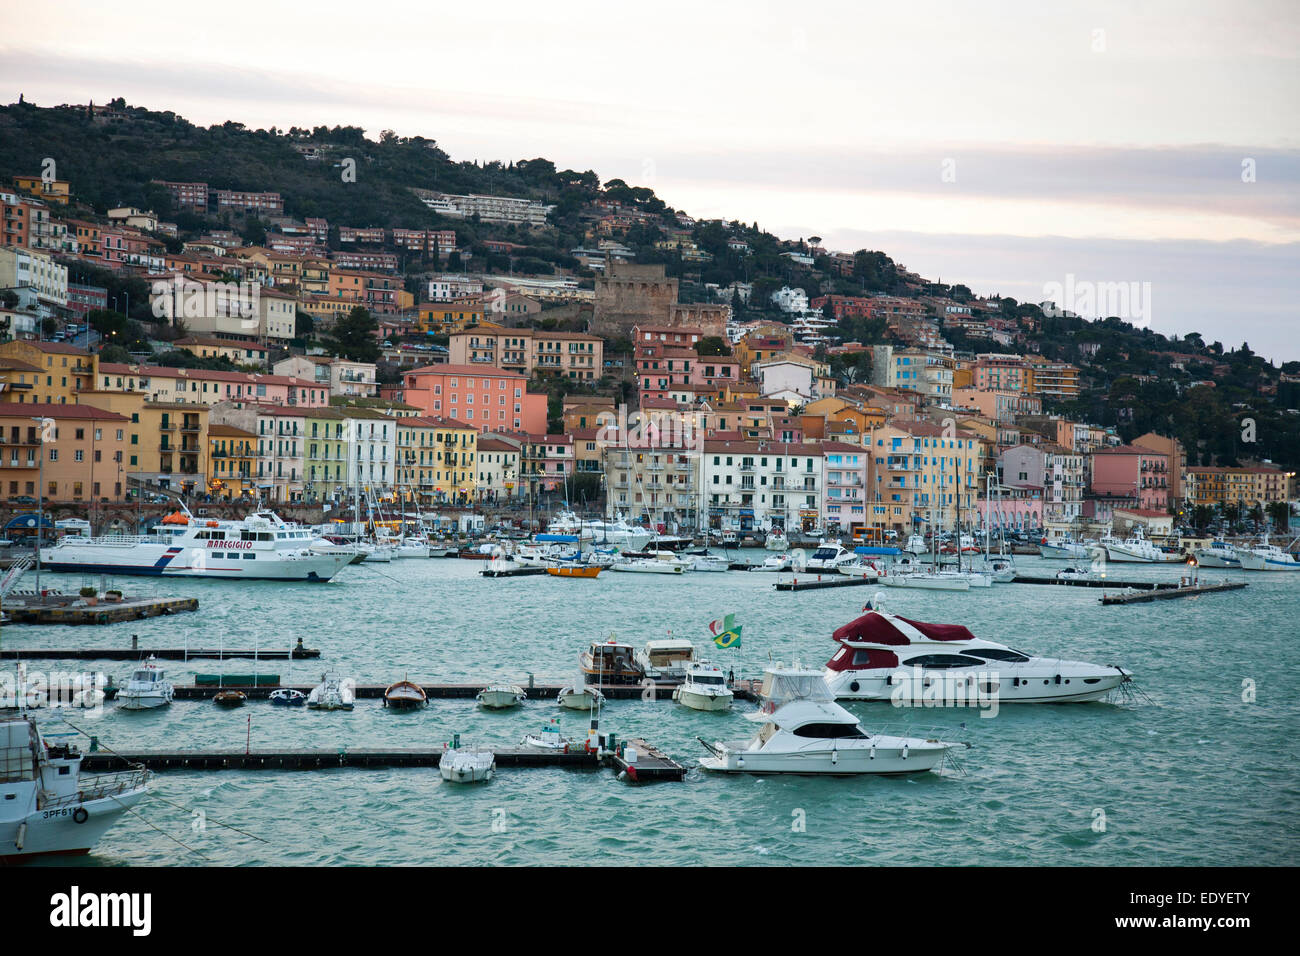 porto santo stefano, argentario, tuscany, italy, europe Stock Photo